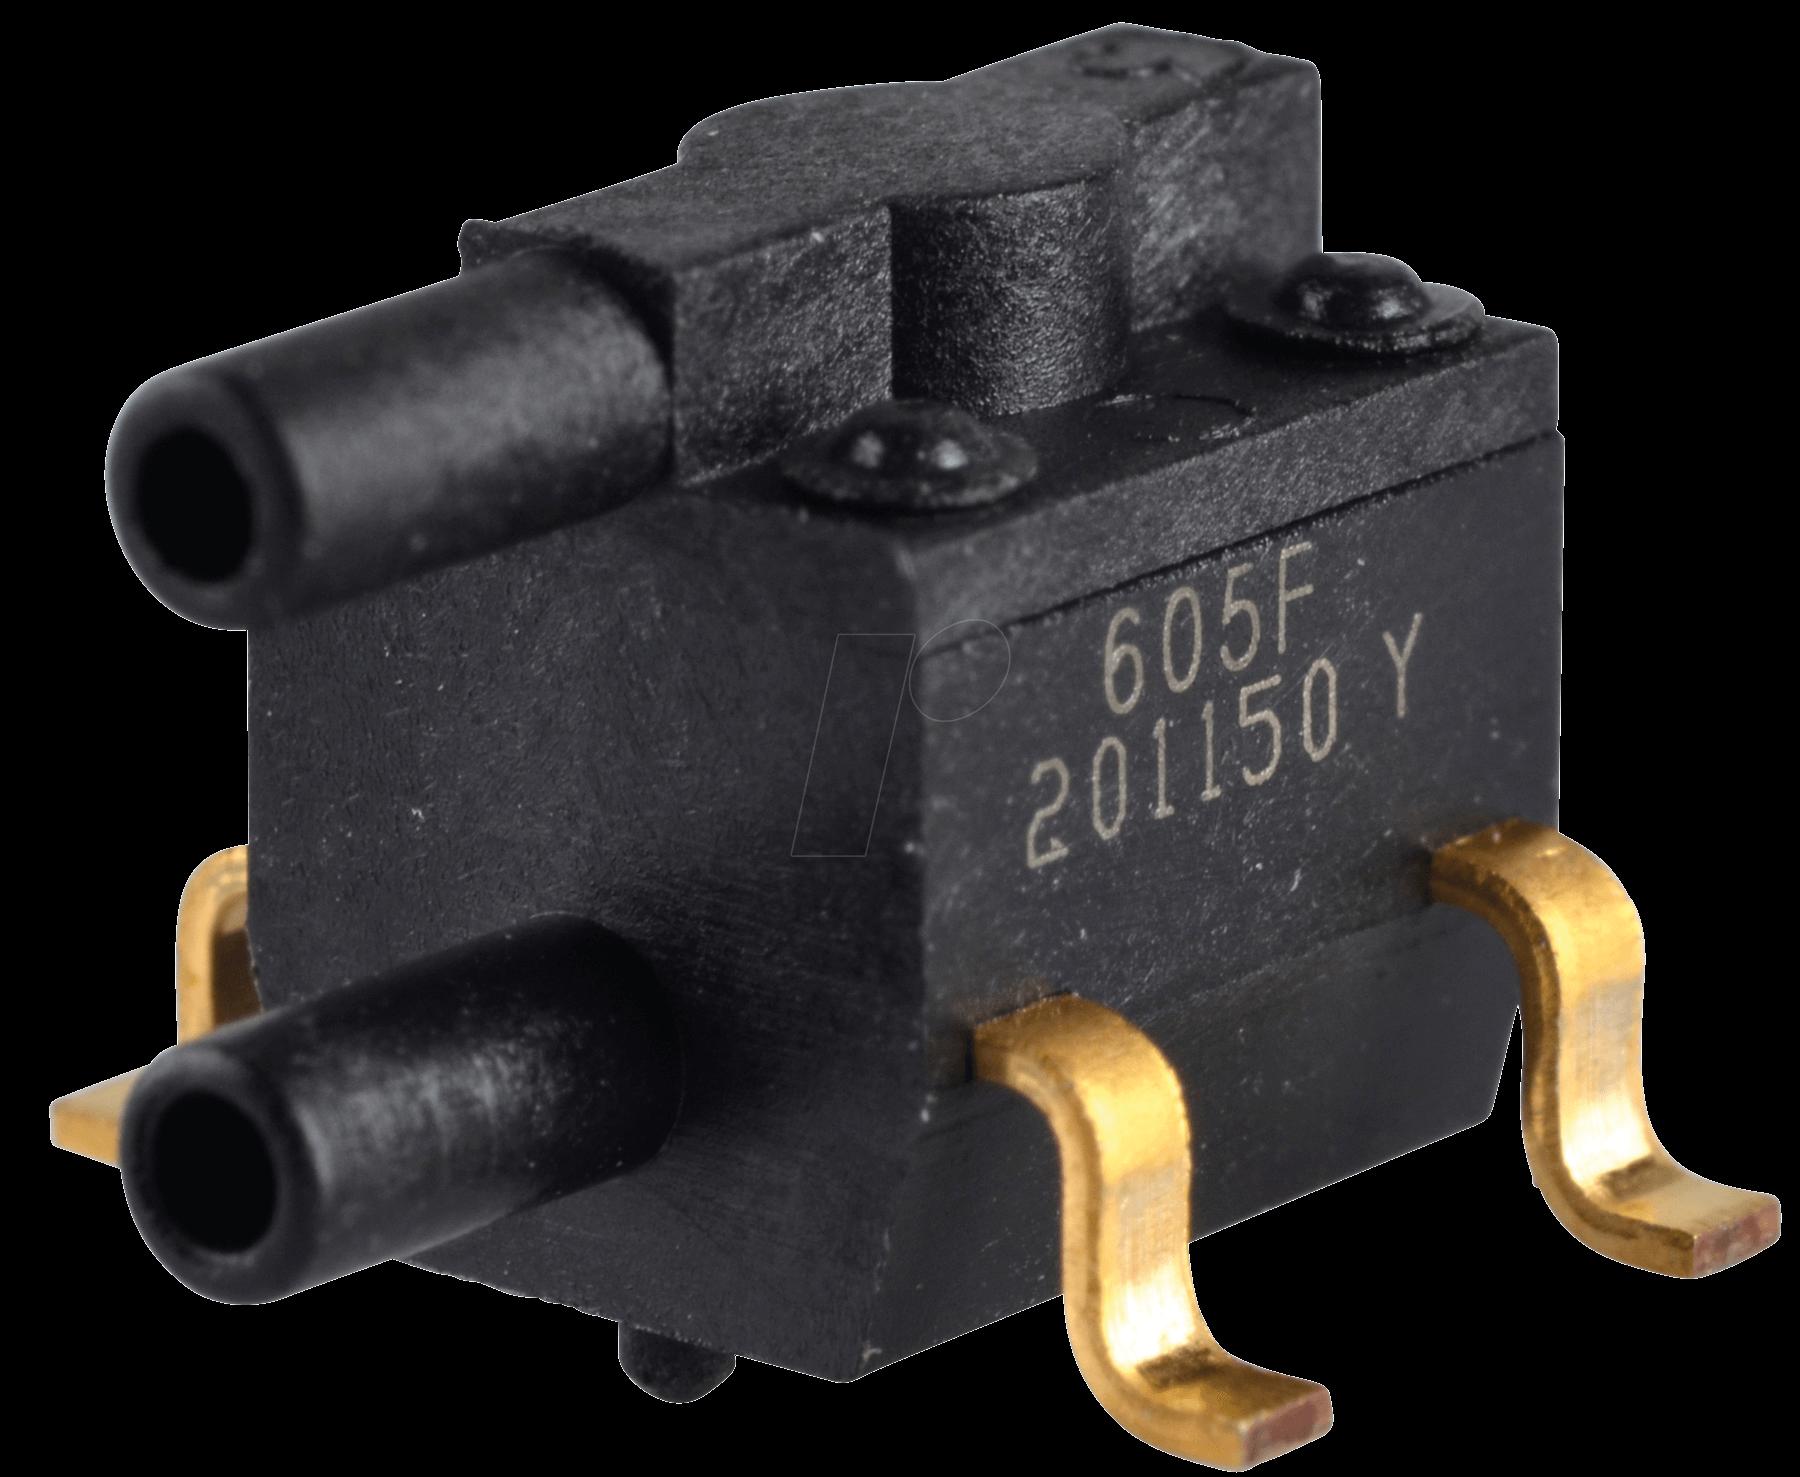 26 PC05 SMT - Differenzdrucksensor, SMD, relativ, ± 5 psi